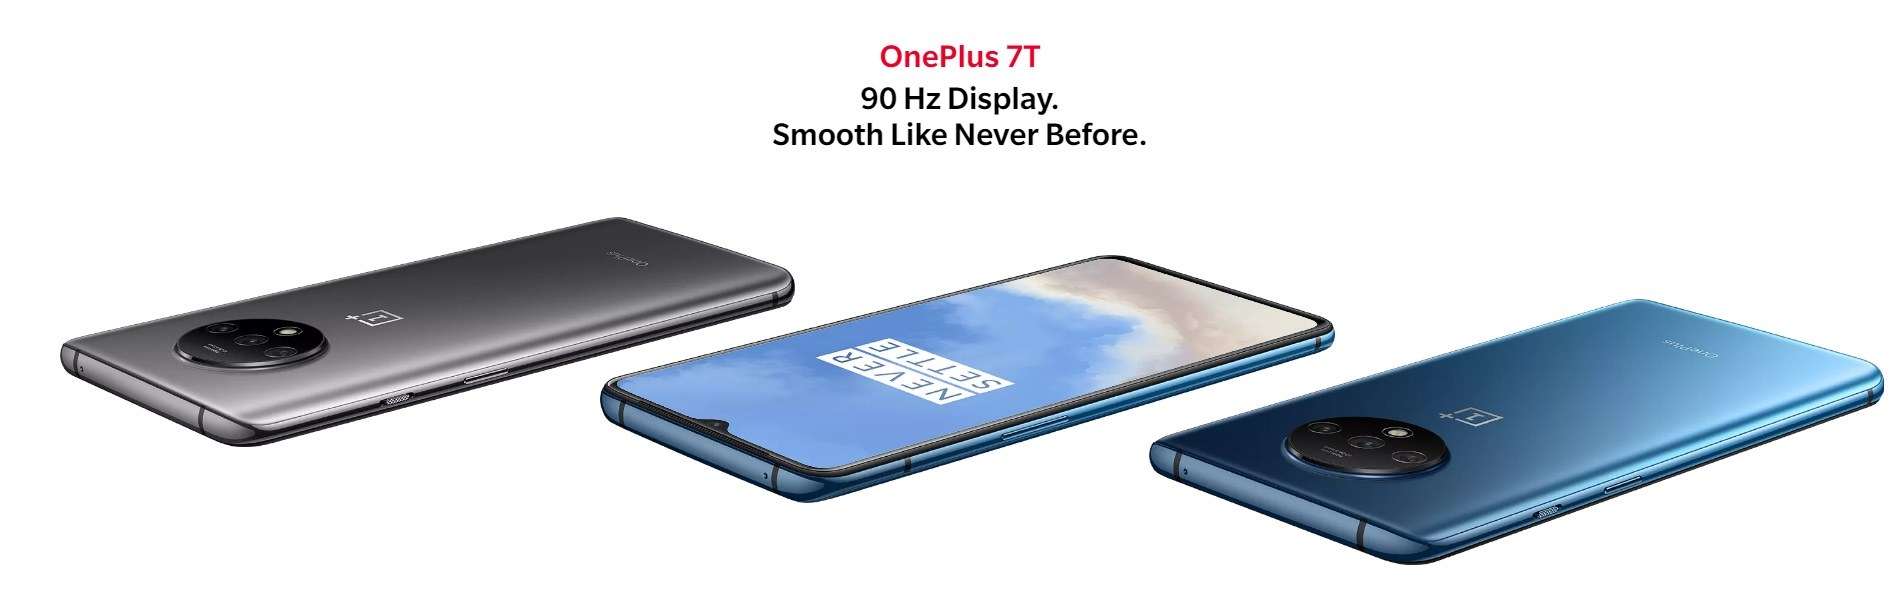 Oneplus 7T Banner